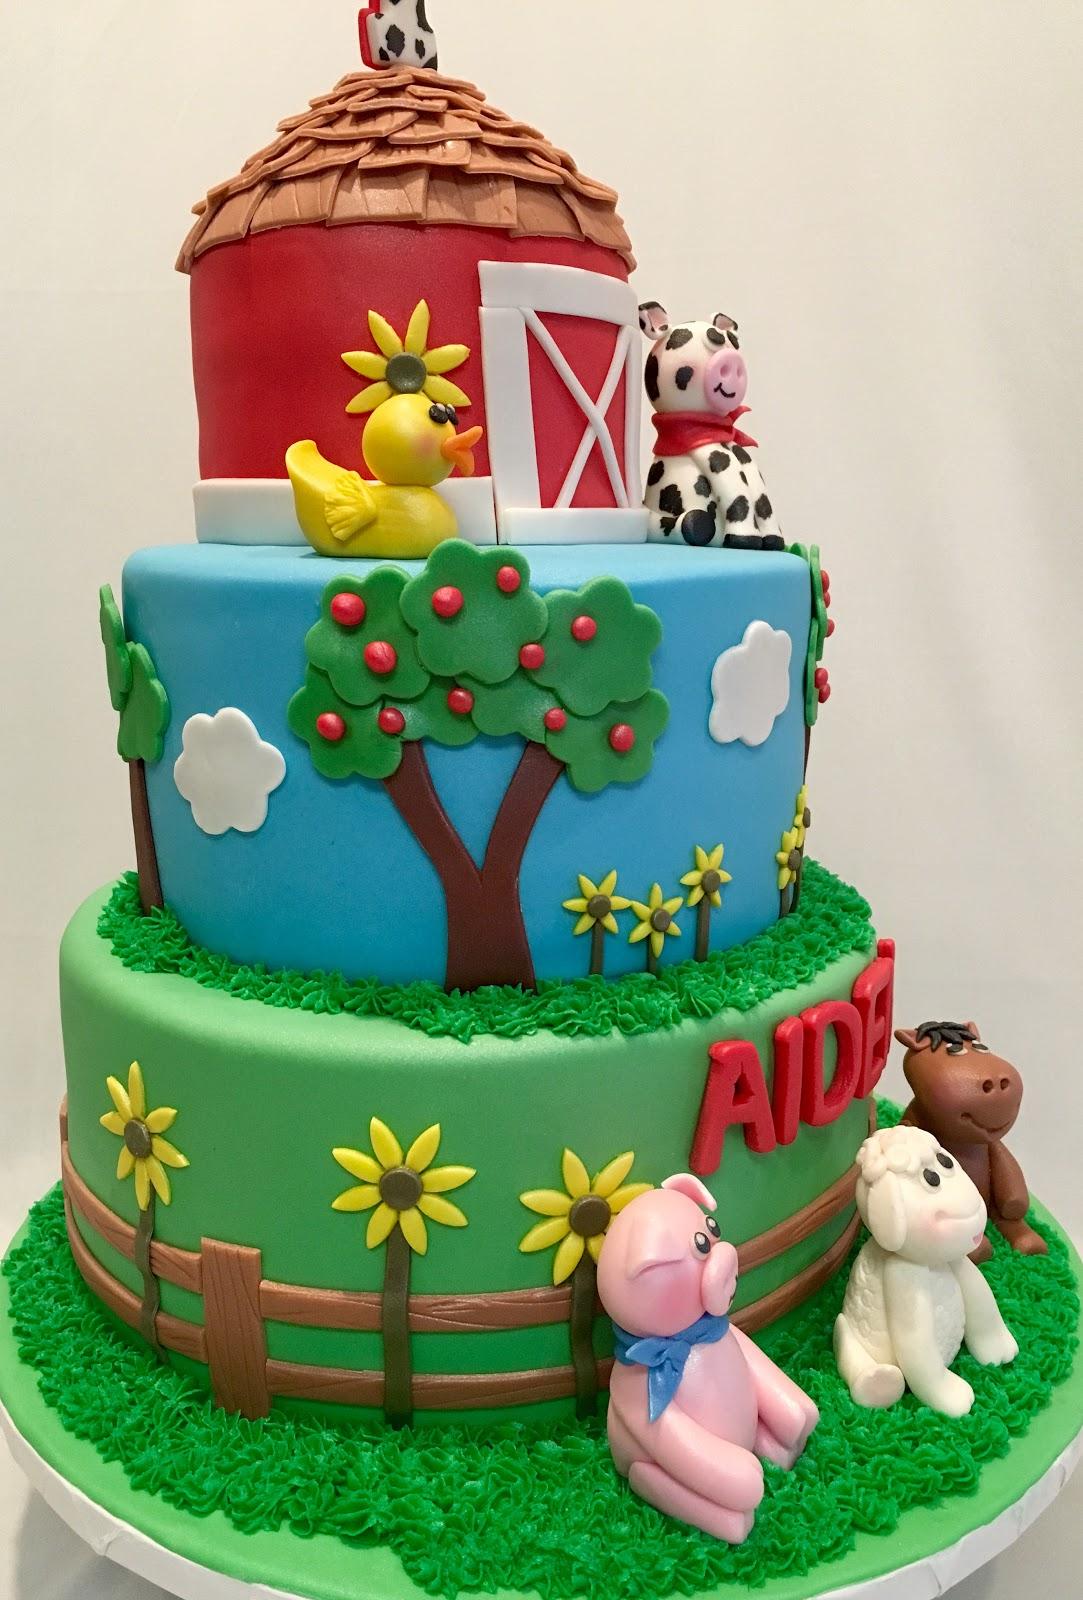 MyMoniCakes: Barnyard cake with fondant animal sculptures